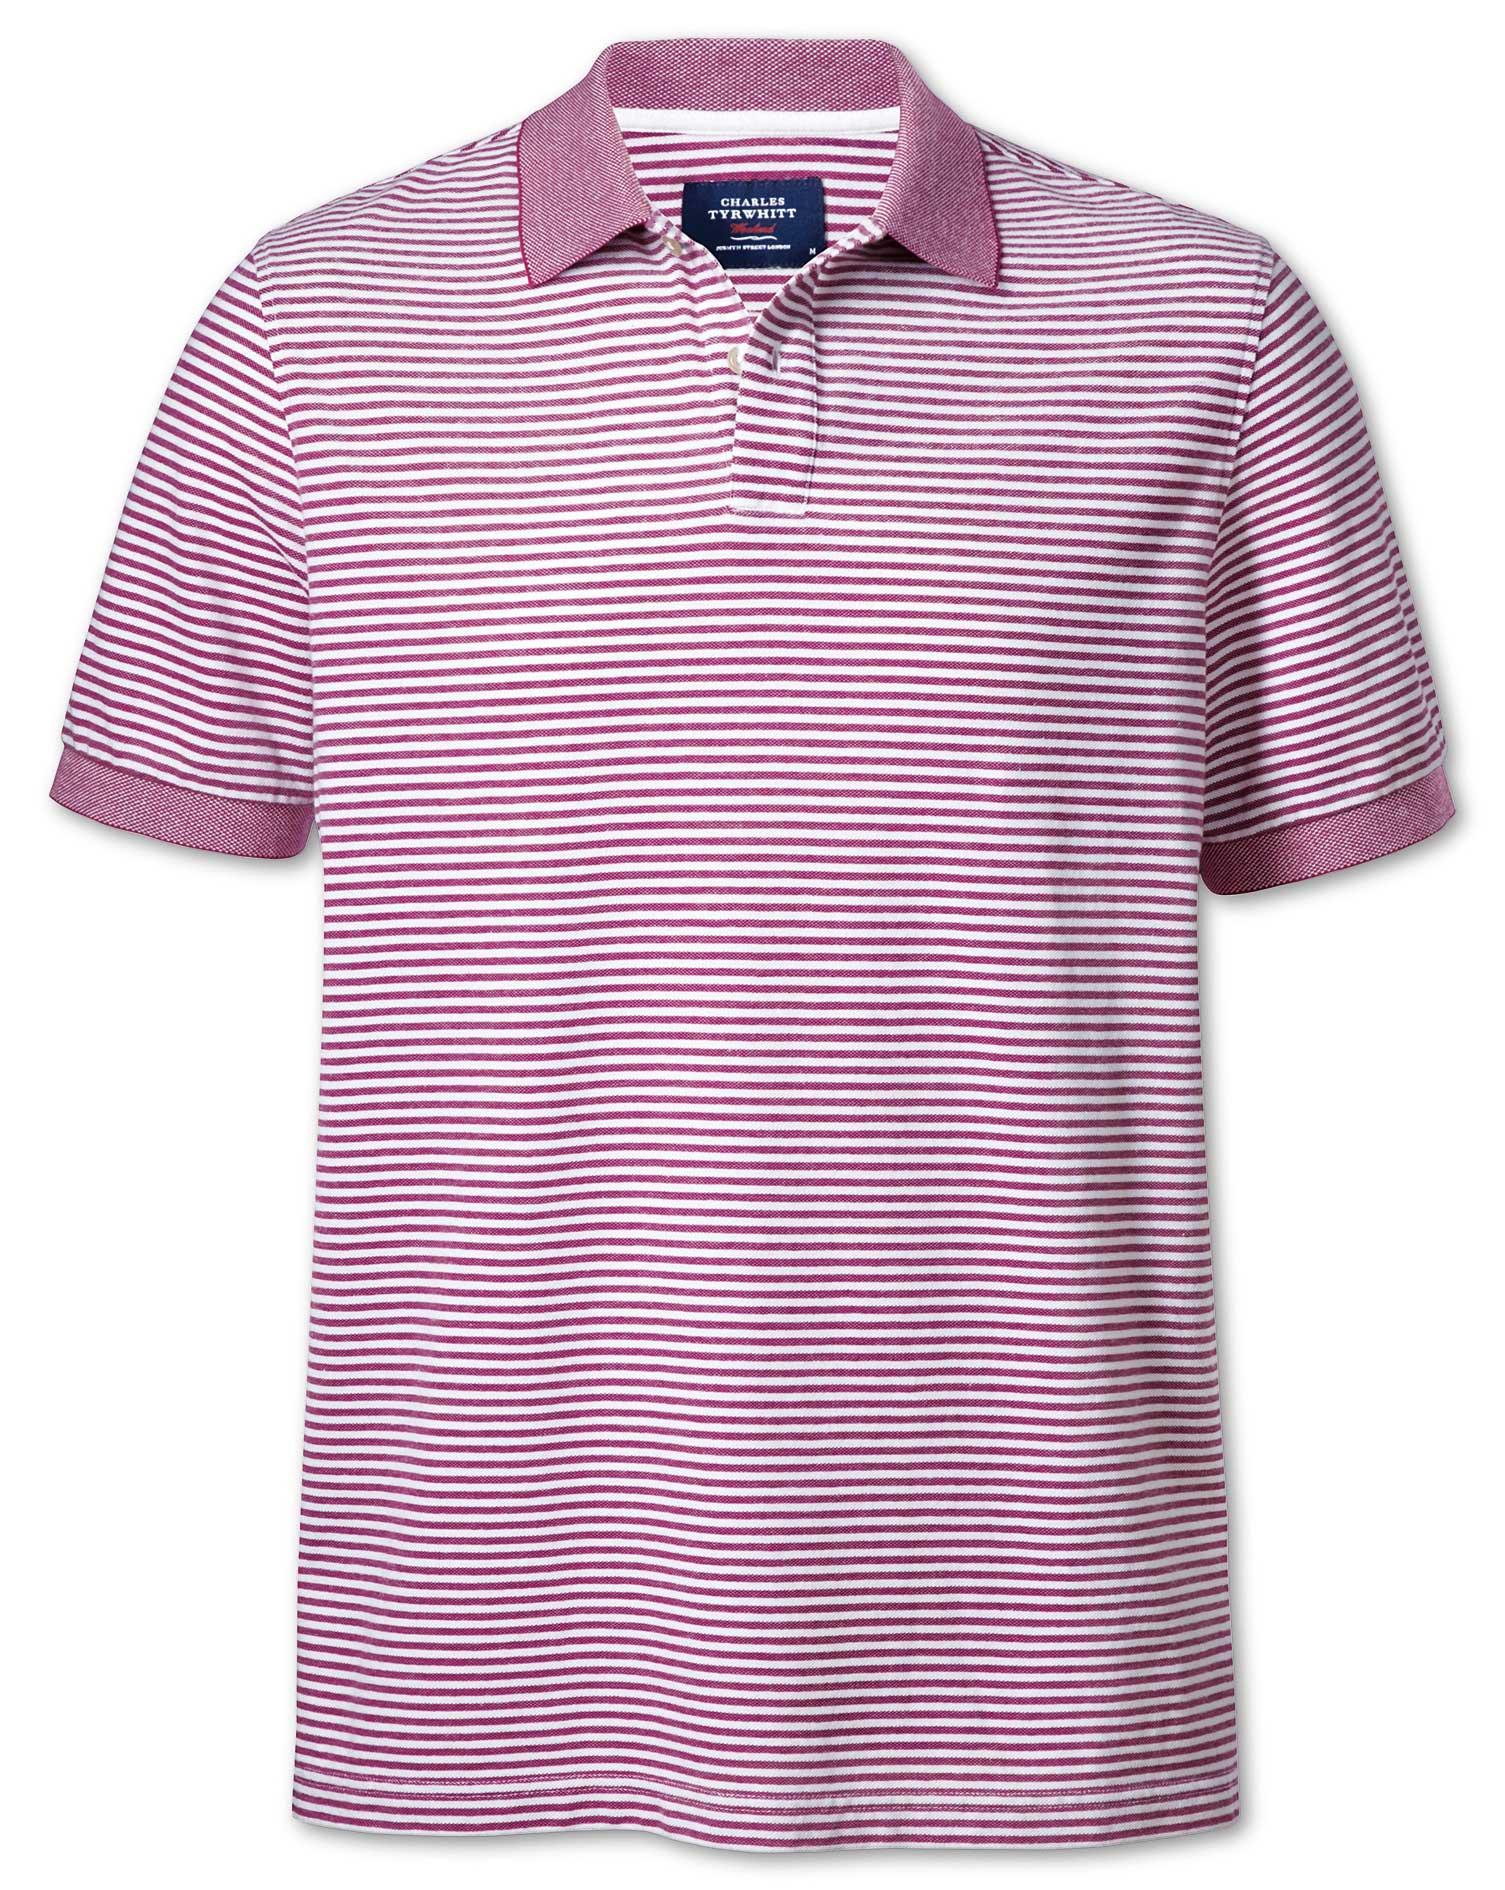 Berry and White Stripe Oxford Cotton Polo Size XXL by Charles Tyrwhitt